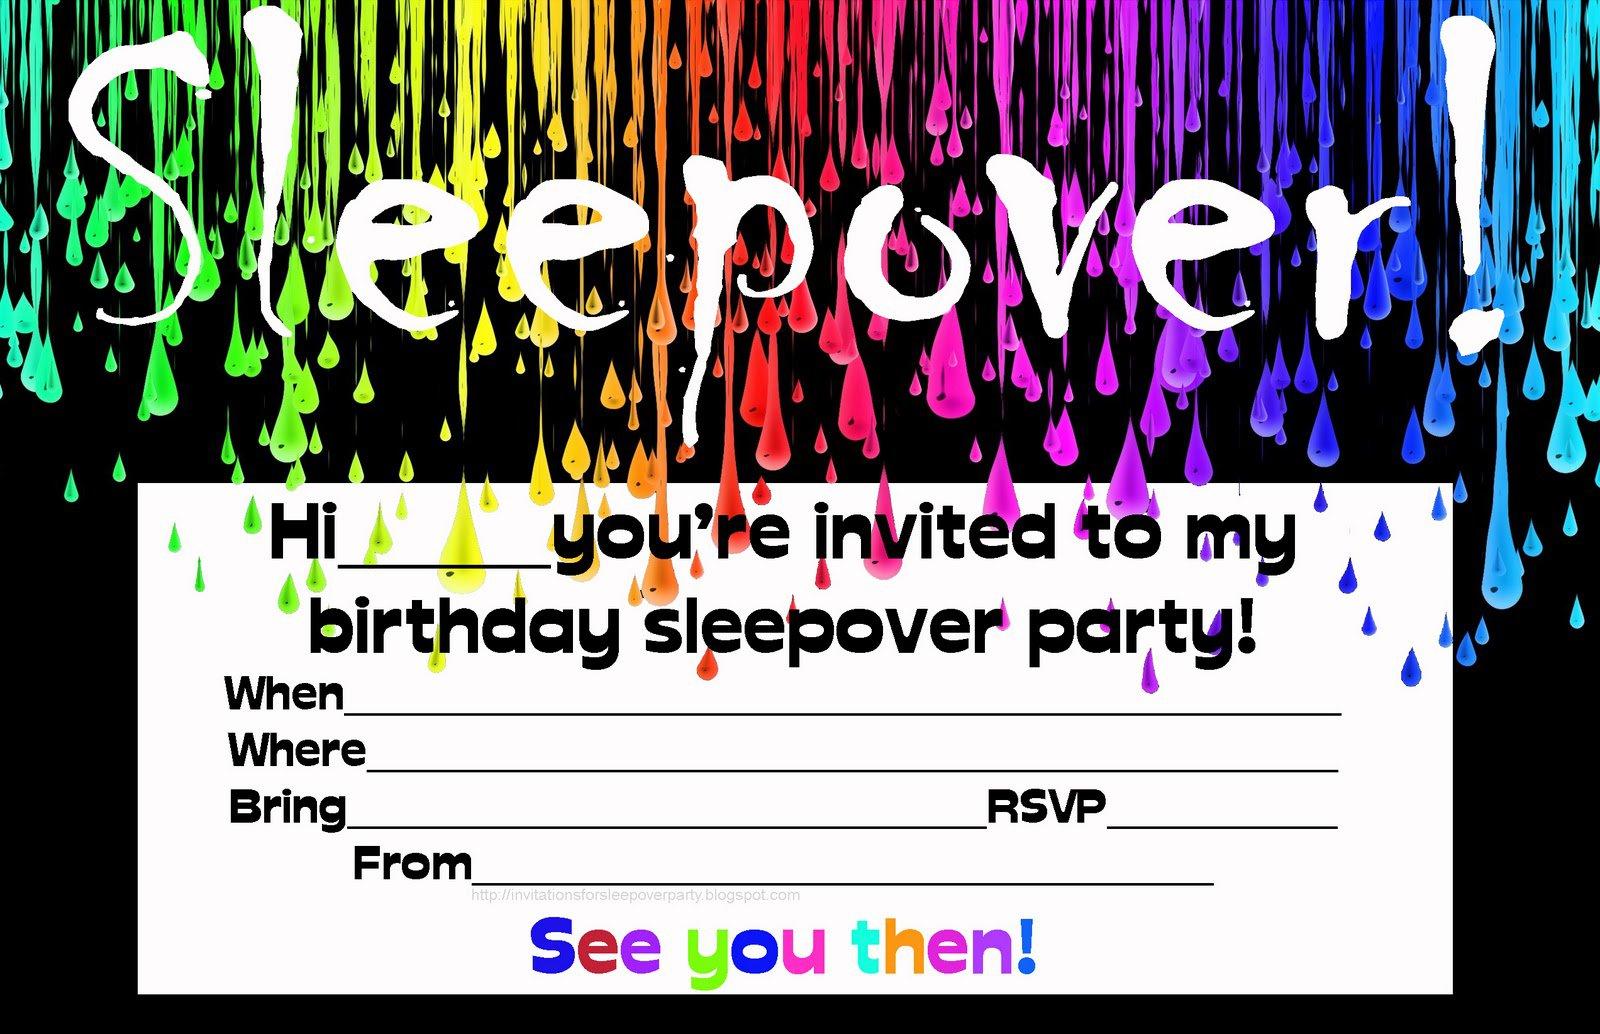 Printable Sleepover Invitations Cards